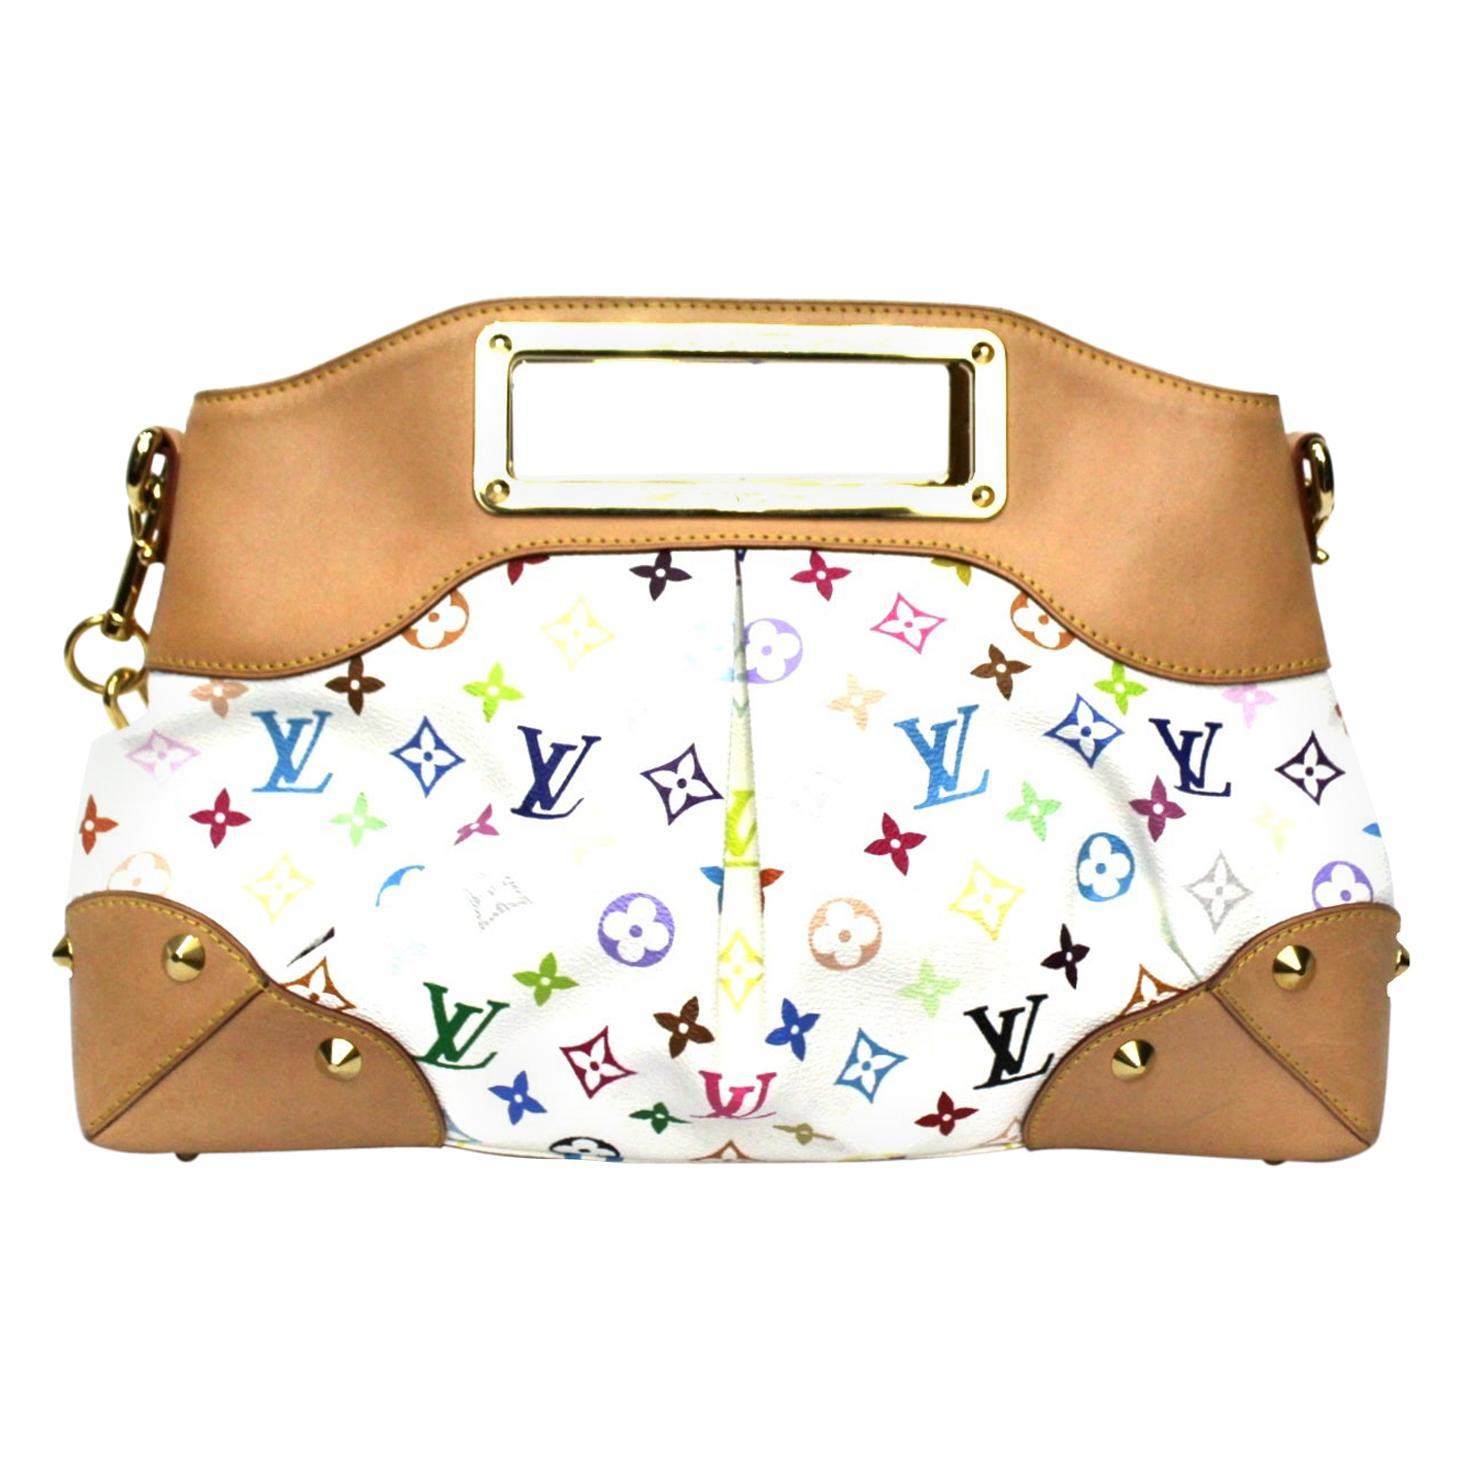 2009 Louis Vuitton Multicolor Leather Judy Bag